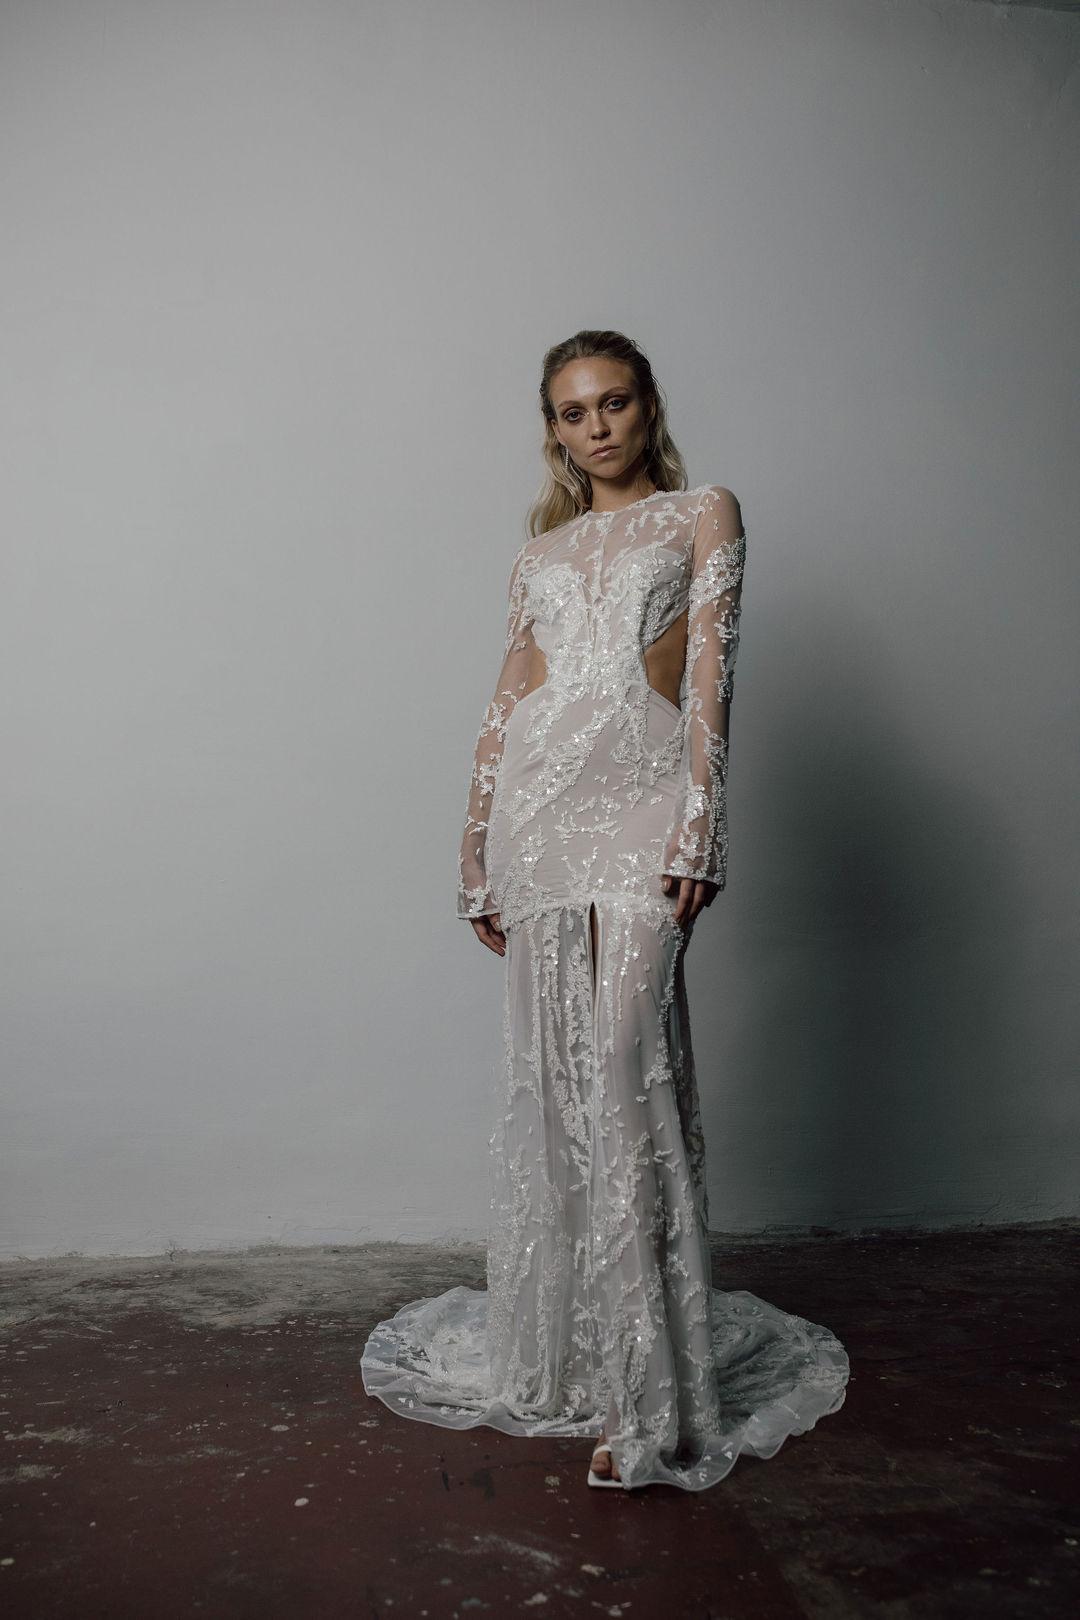 blank dress dress photo